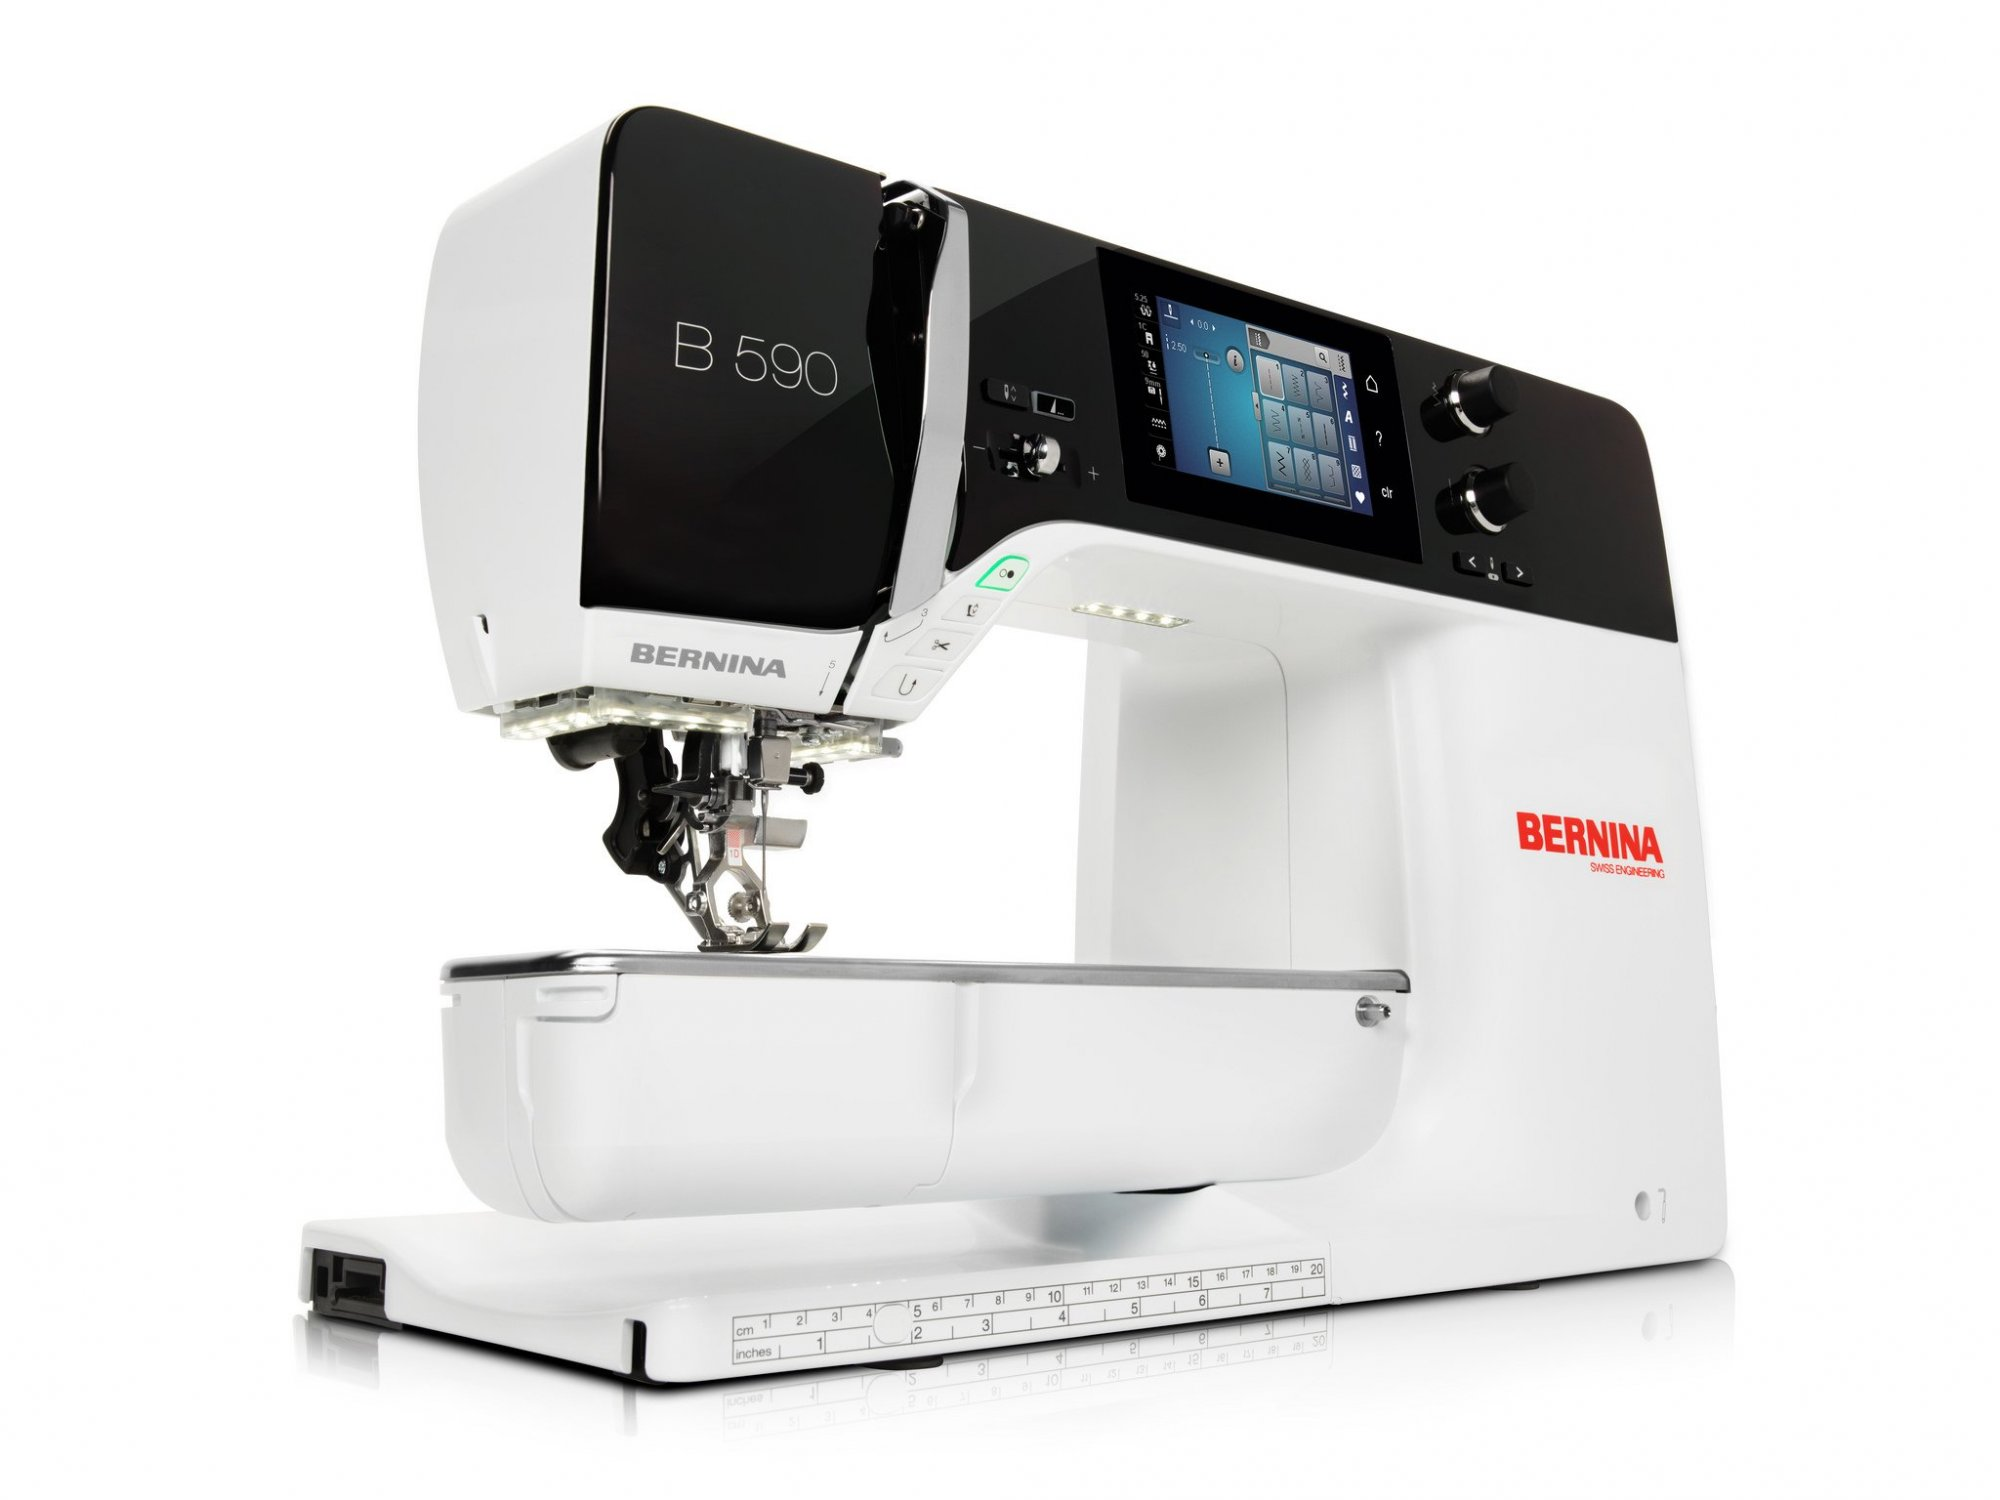 Bernina 590 Sewing Machine